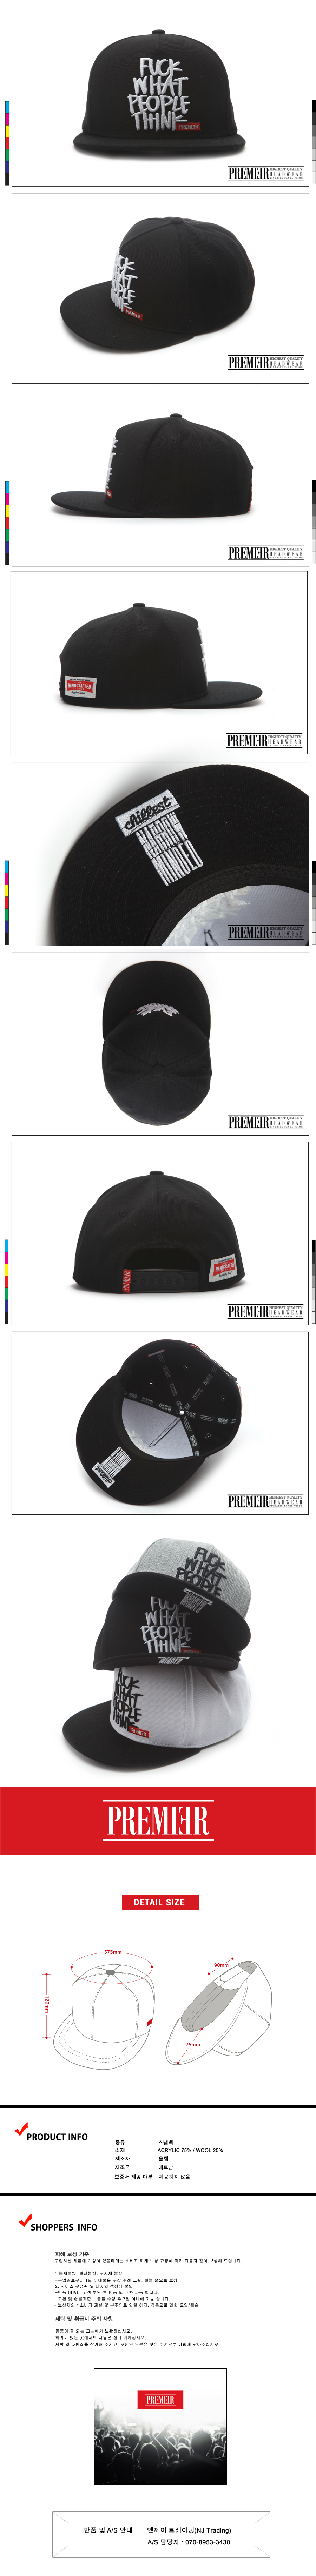 [ PREMIER ] [Premier] Snapback FWPT Black